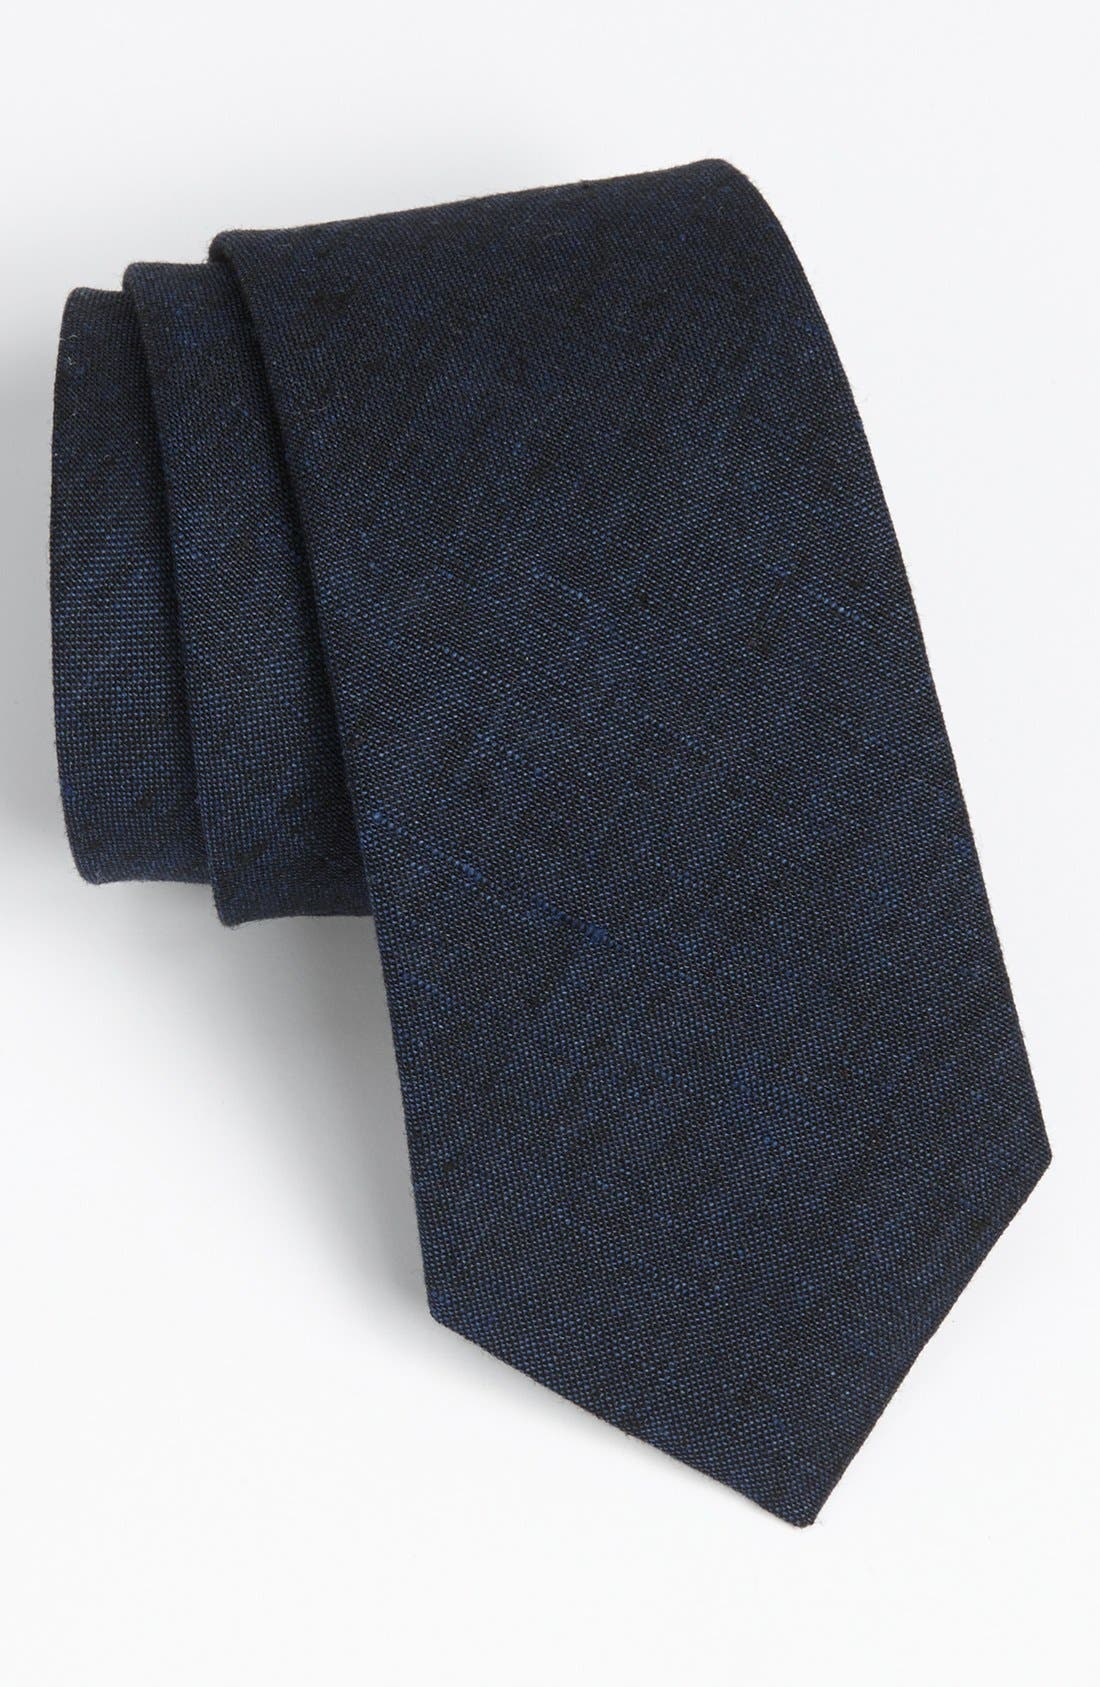 Alternate Image 1 Selected - Robert Stewart Woven Tie